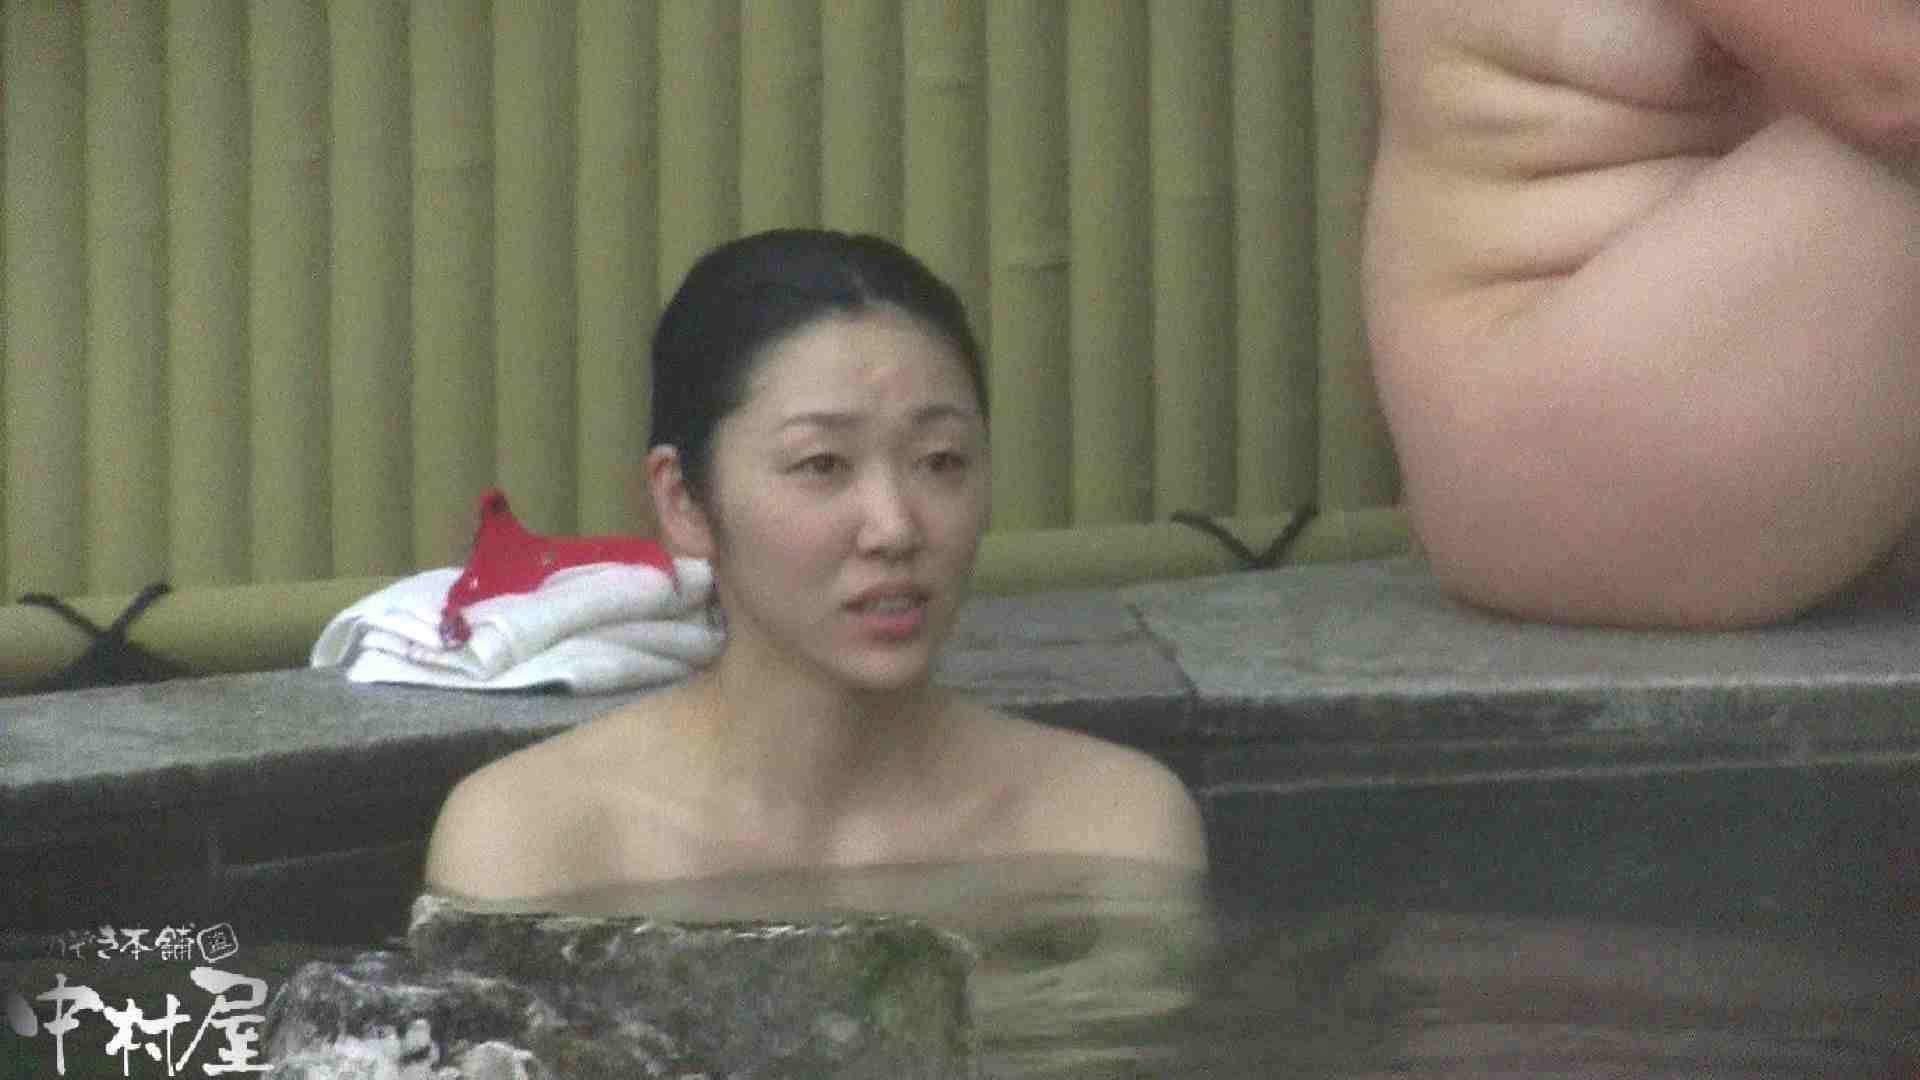 Aquaな露天風呂Vol.917 盗撮シリーズ   露天風呂編  108PIX 29